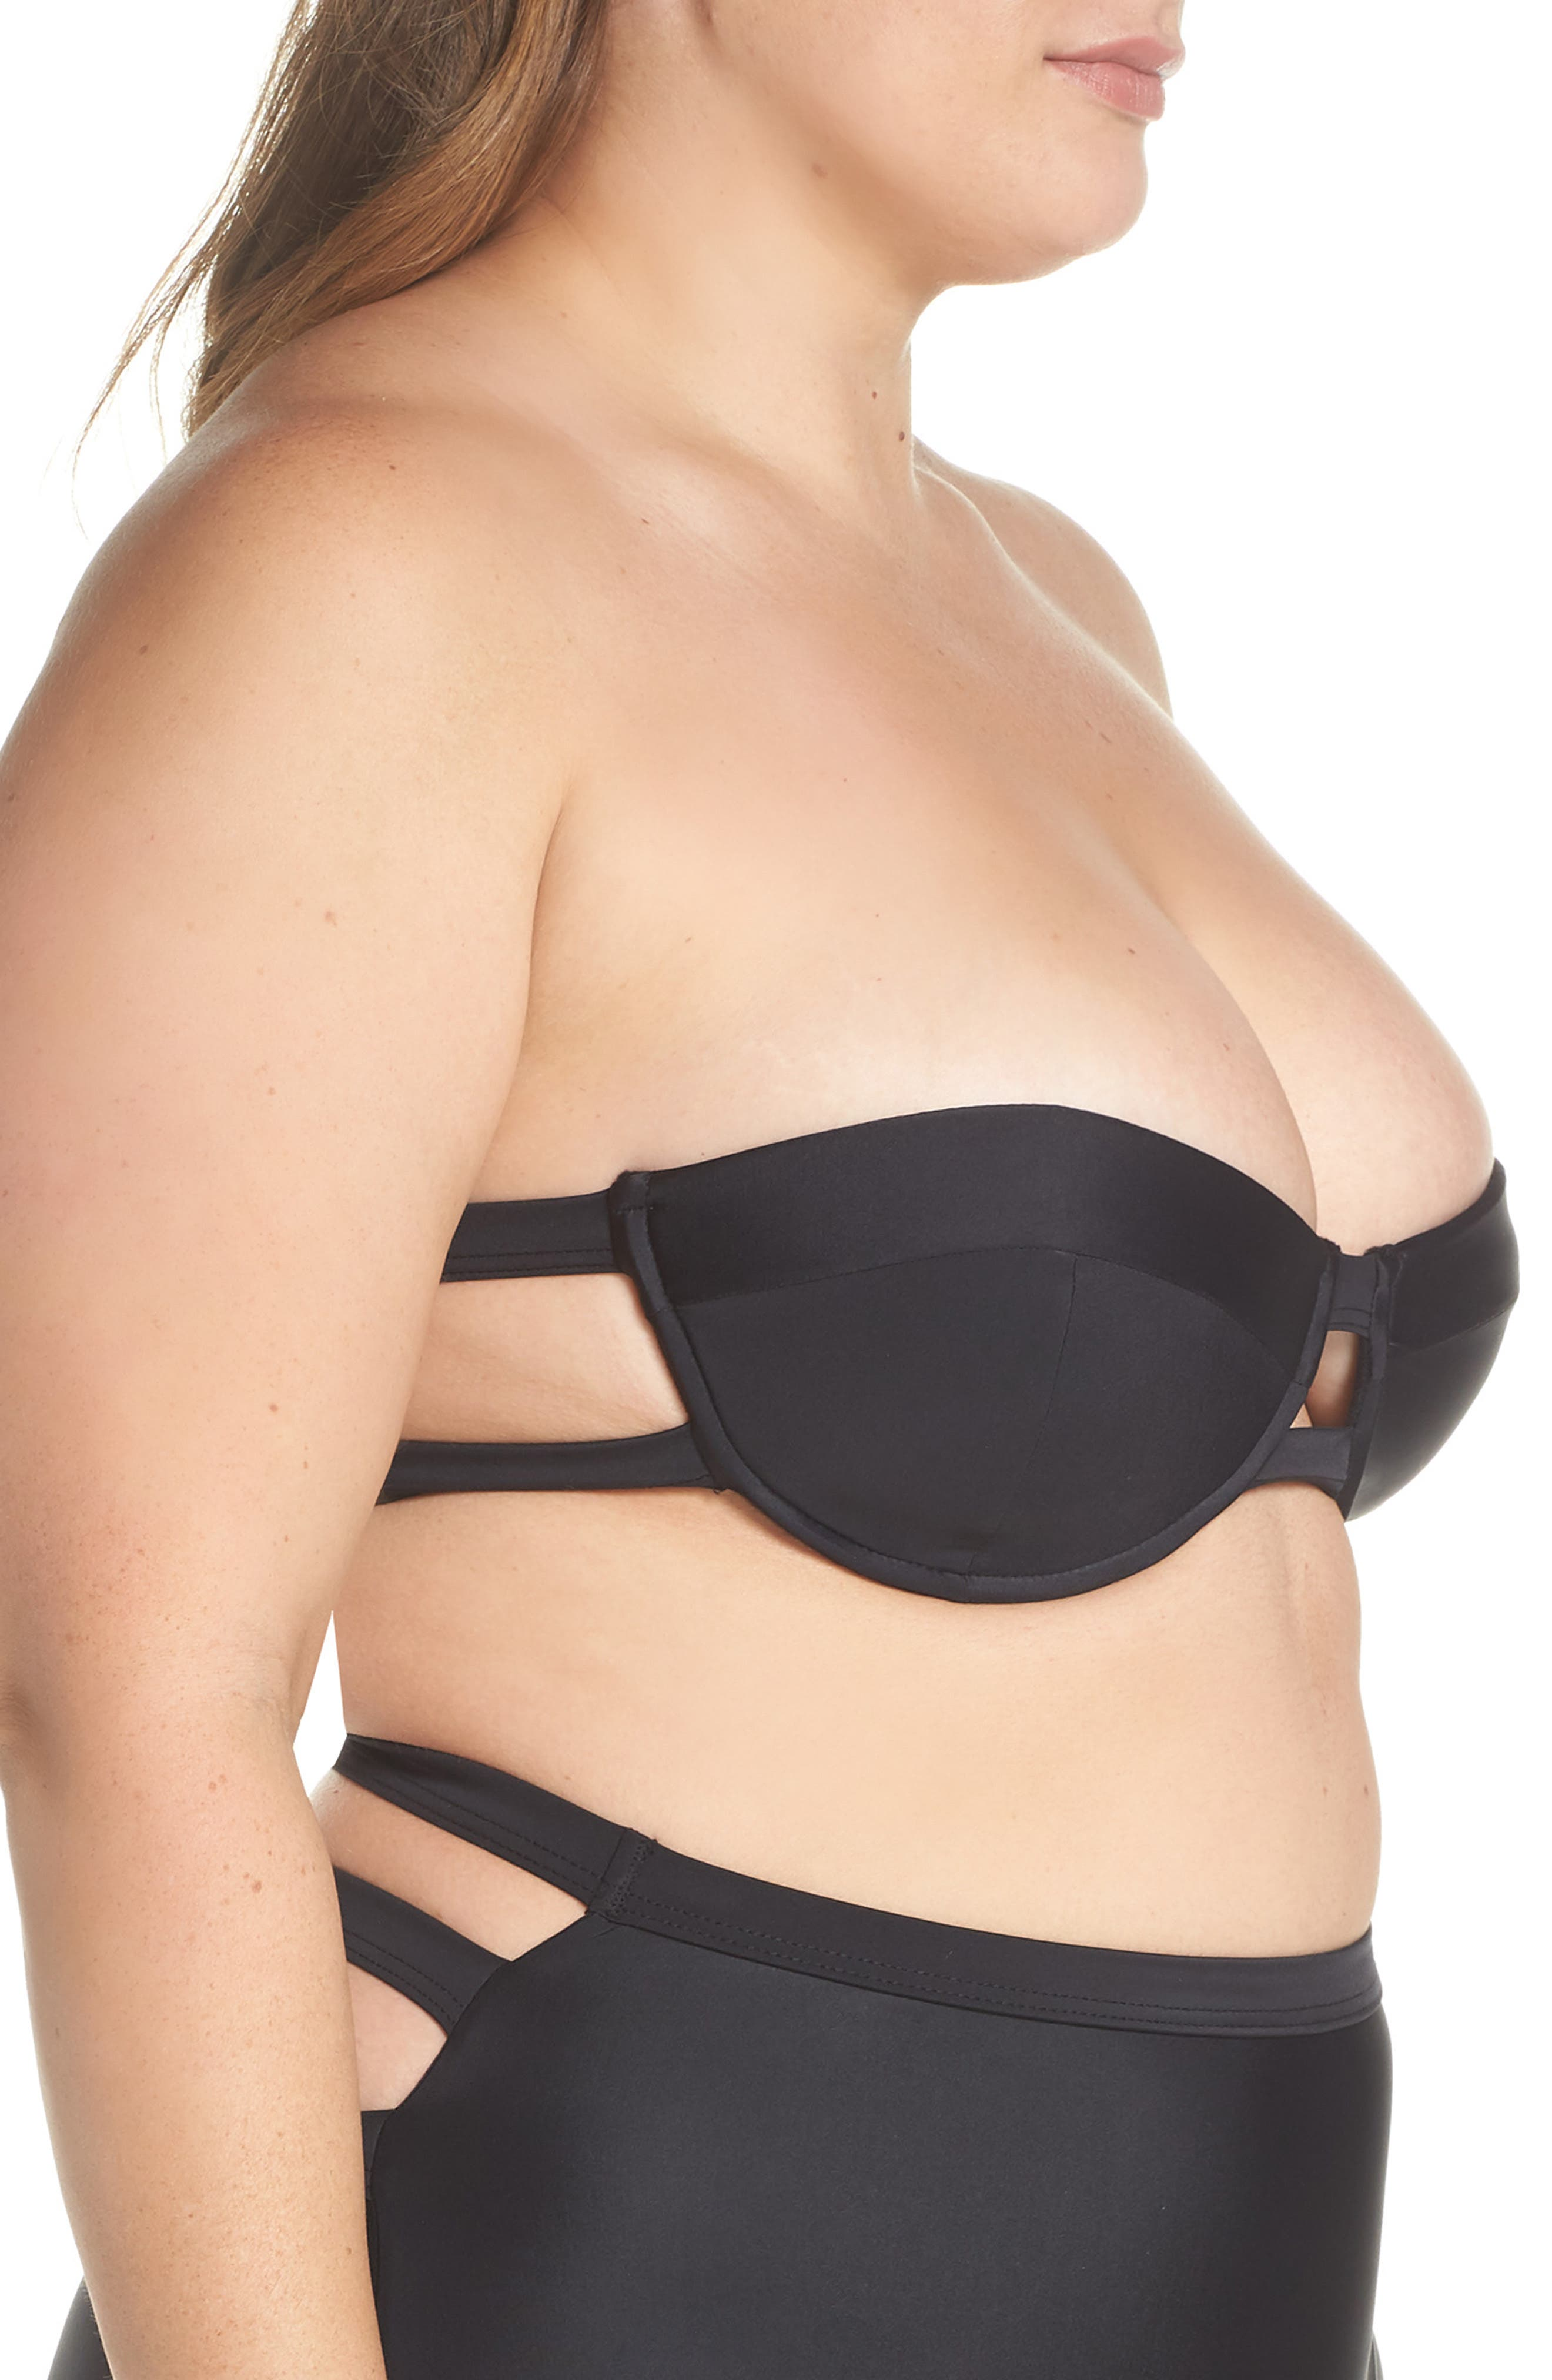 Bouloux II Underwire Bikini Top,                             Alternate thumbnail 4, color,                             001